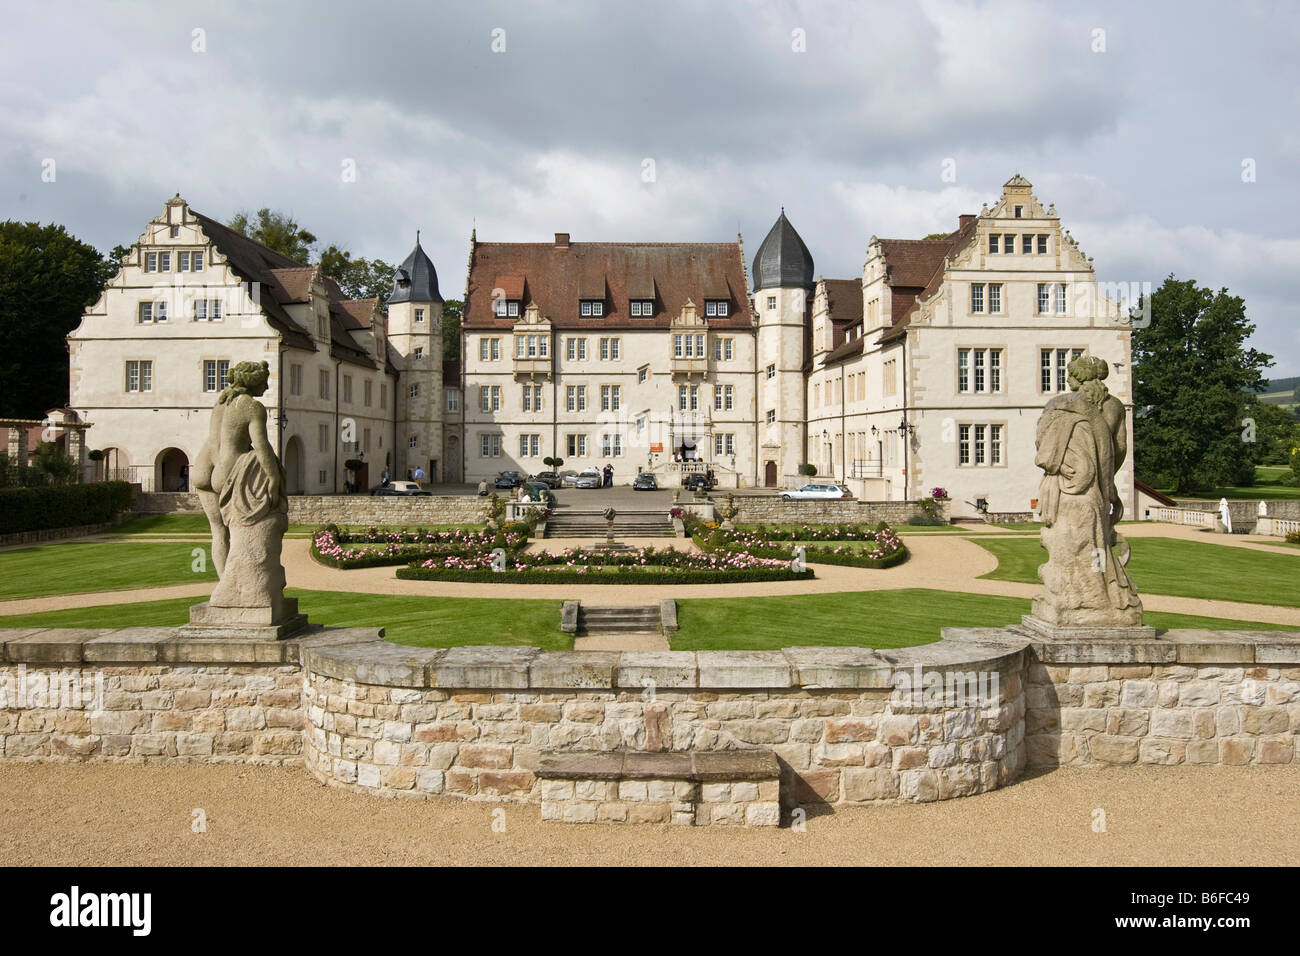 Muenchhausen Palace Hotel, Baja Sajonia, Alemania, Europa Foto de stock